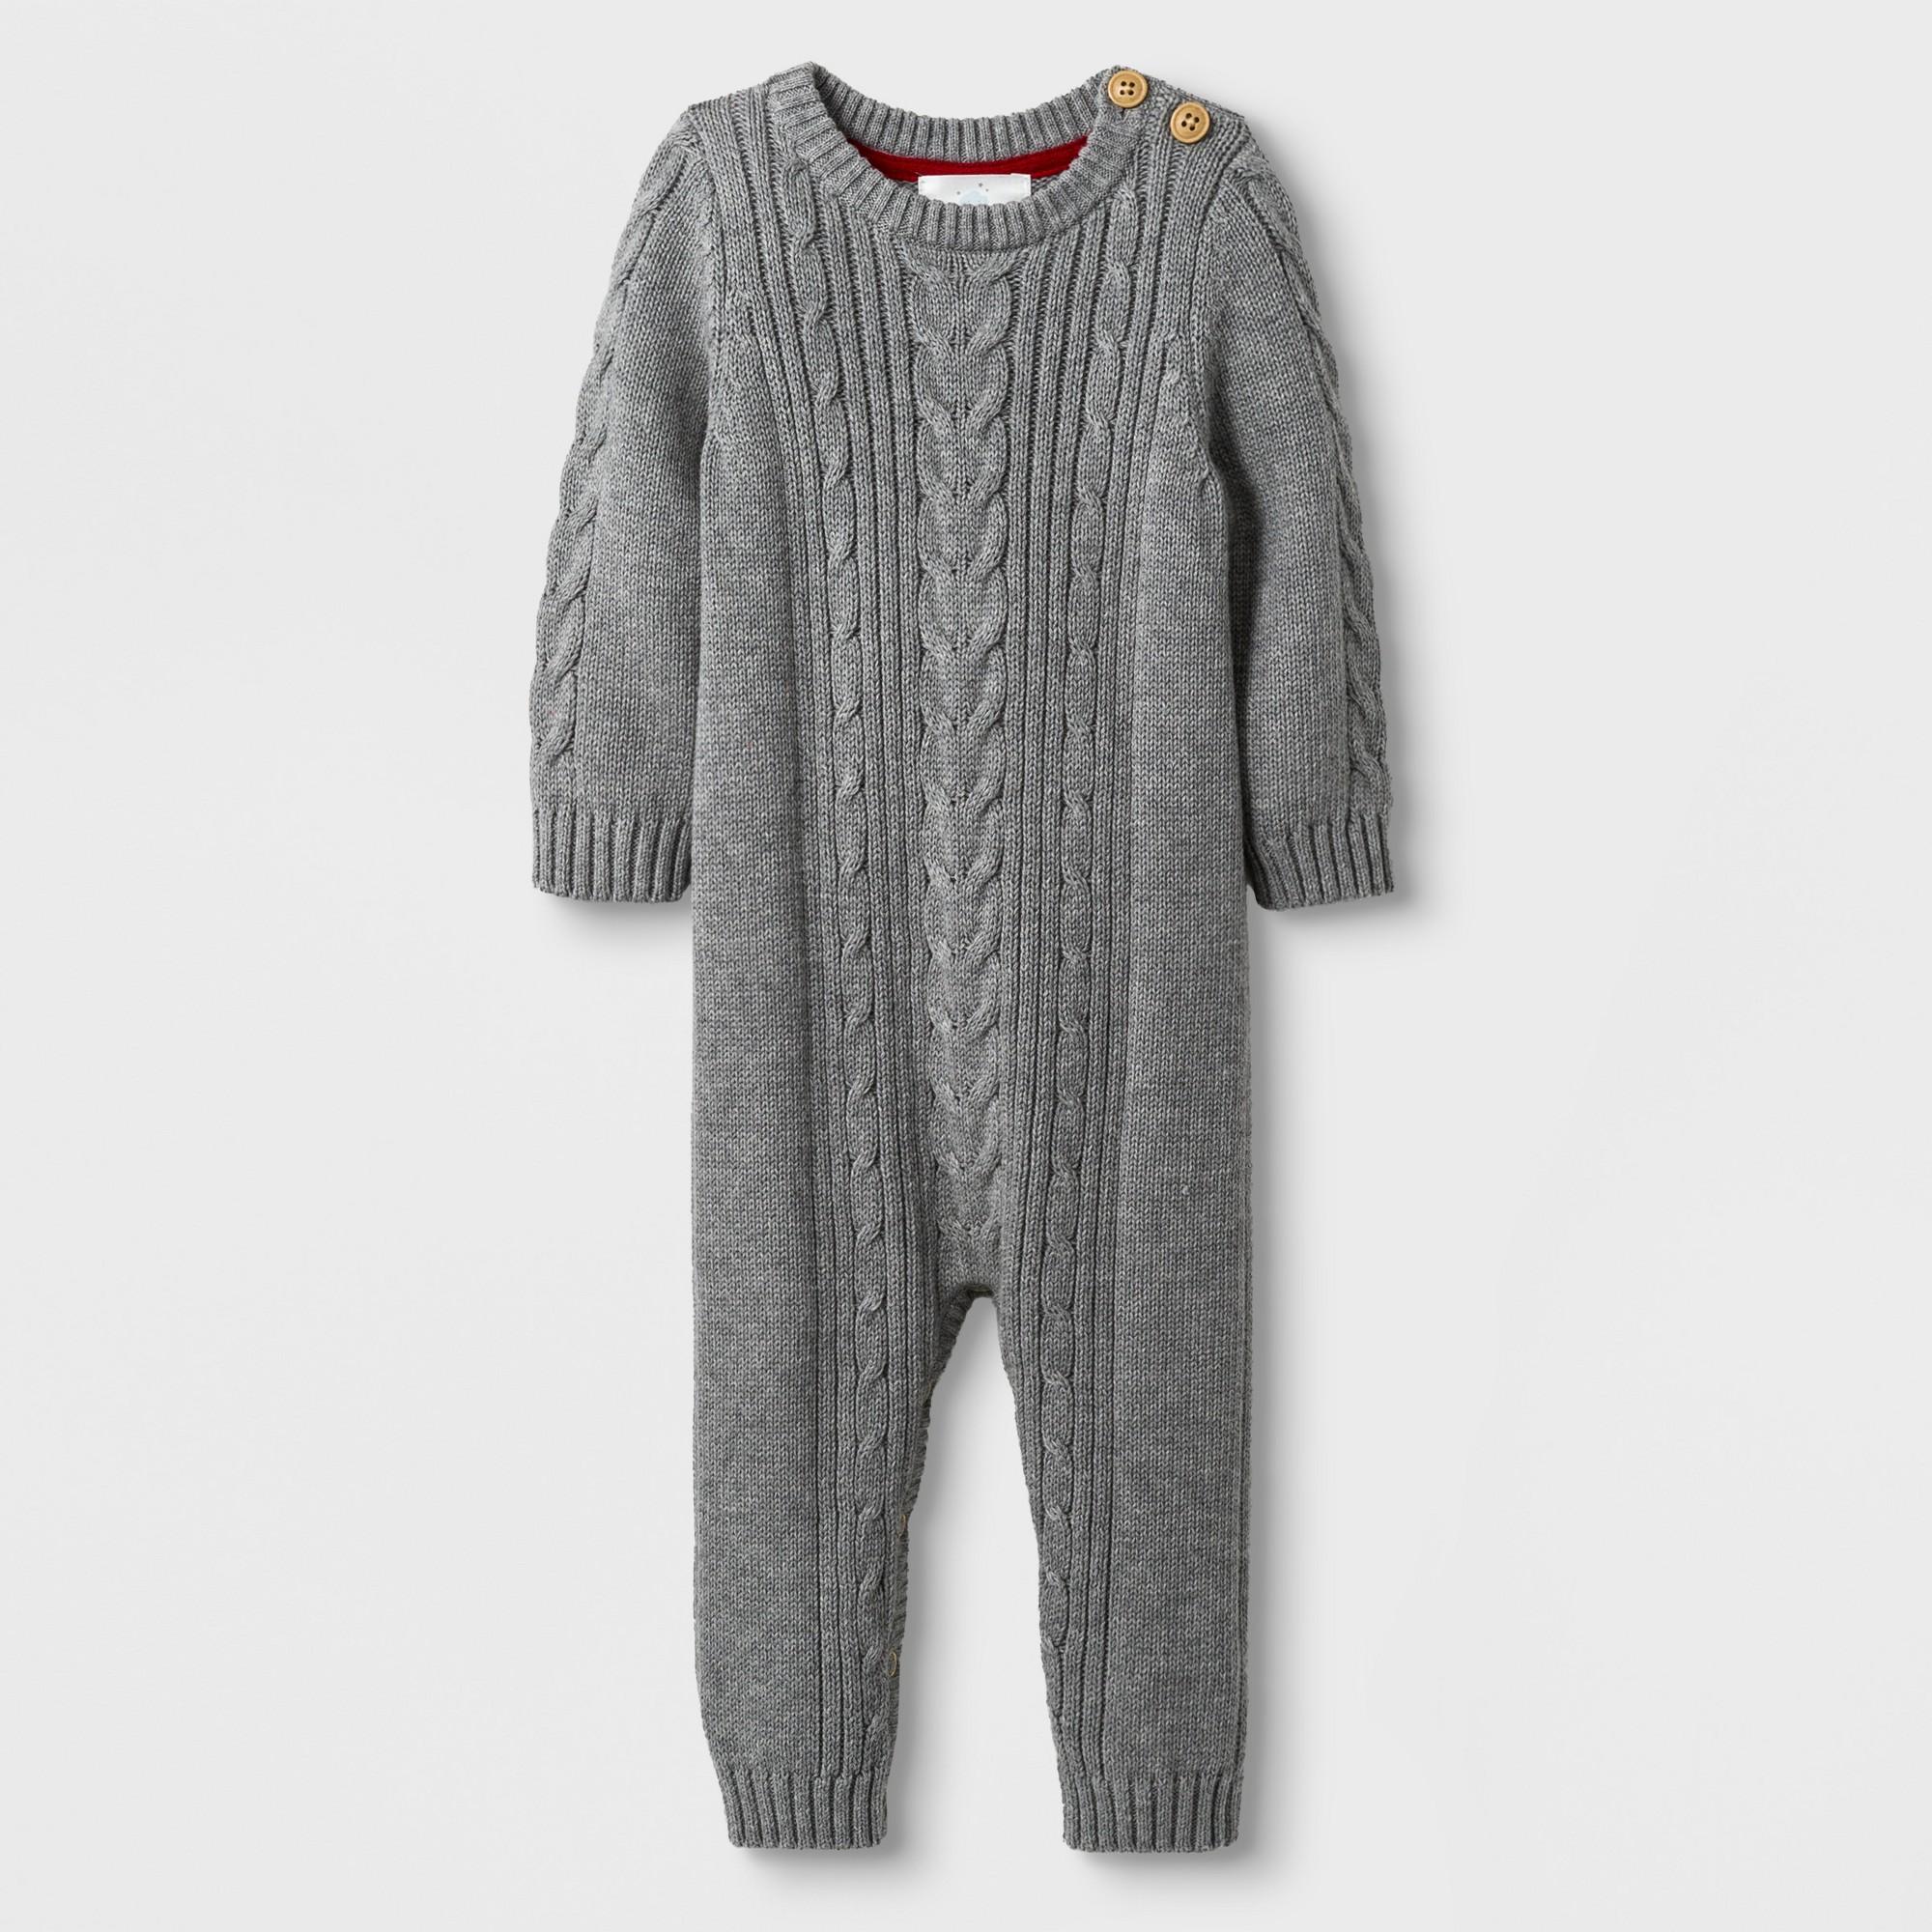 017cdf24d3bd Baby Girls  Long Sleeve Cable Sweater Romper - Cloud Island Heather Gray  Newborn